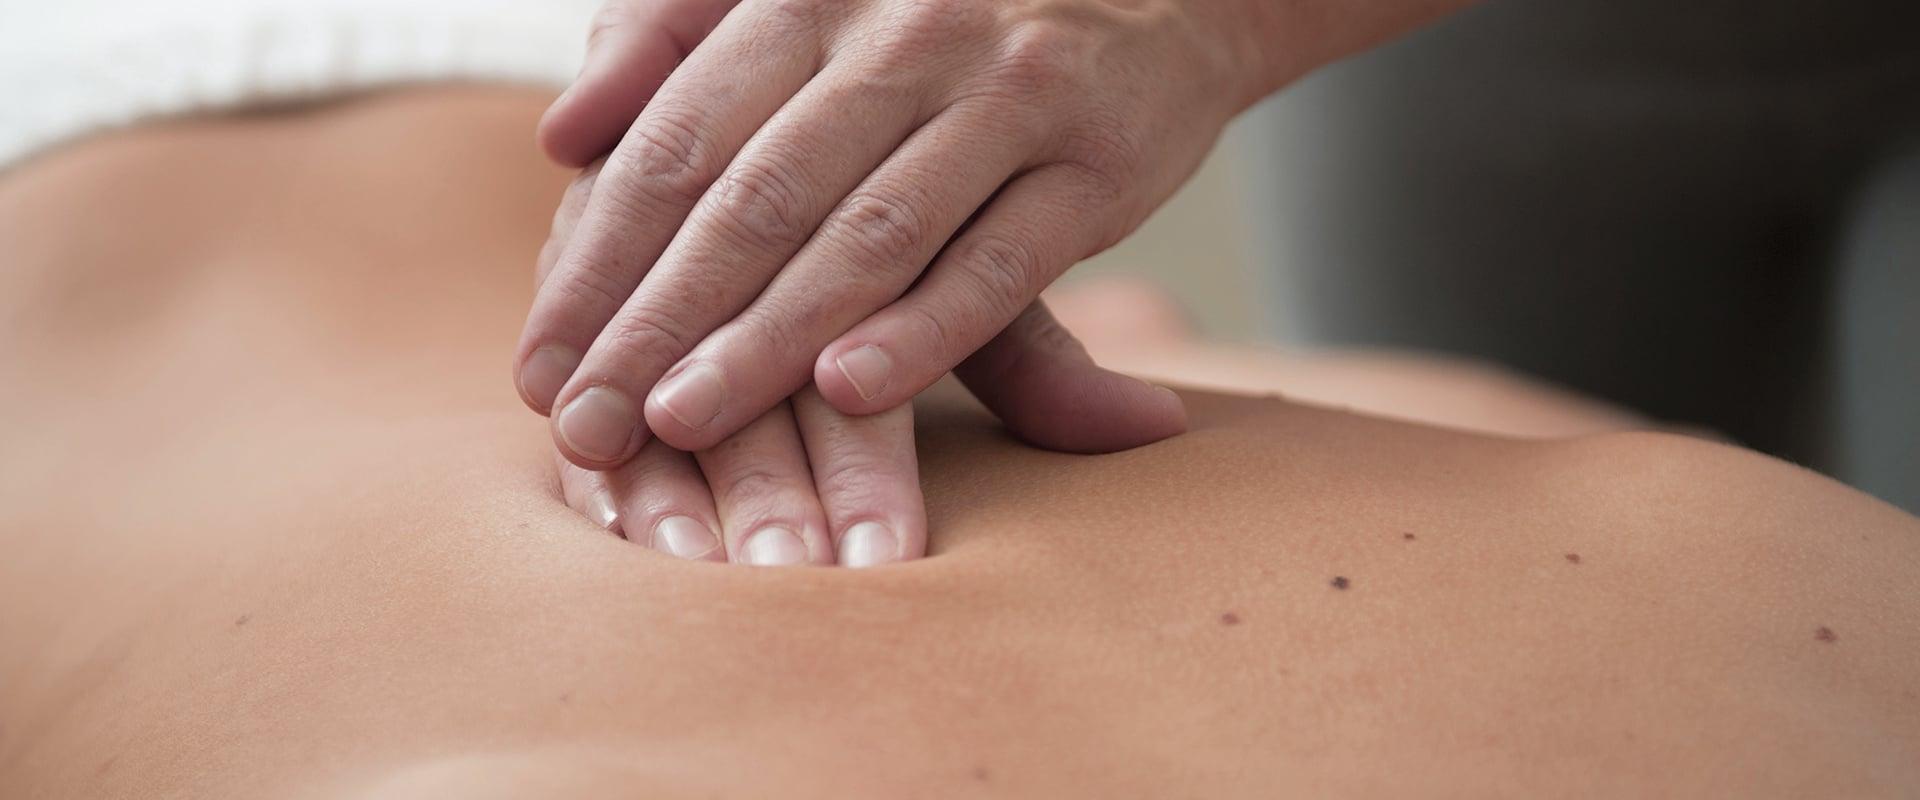 body-relax-massages-gommages-institut-de-beaute-absolu-institut-gaillard-haute-savoie-geneve